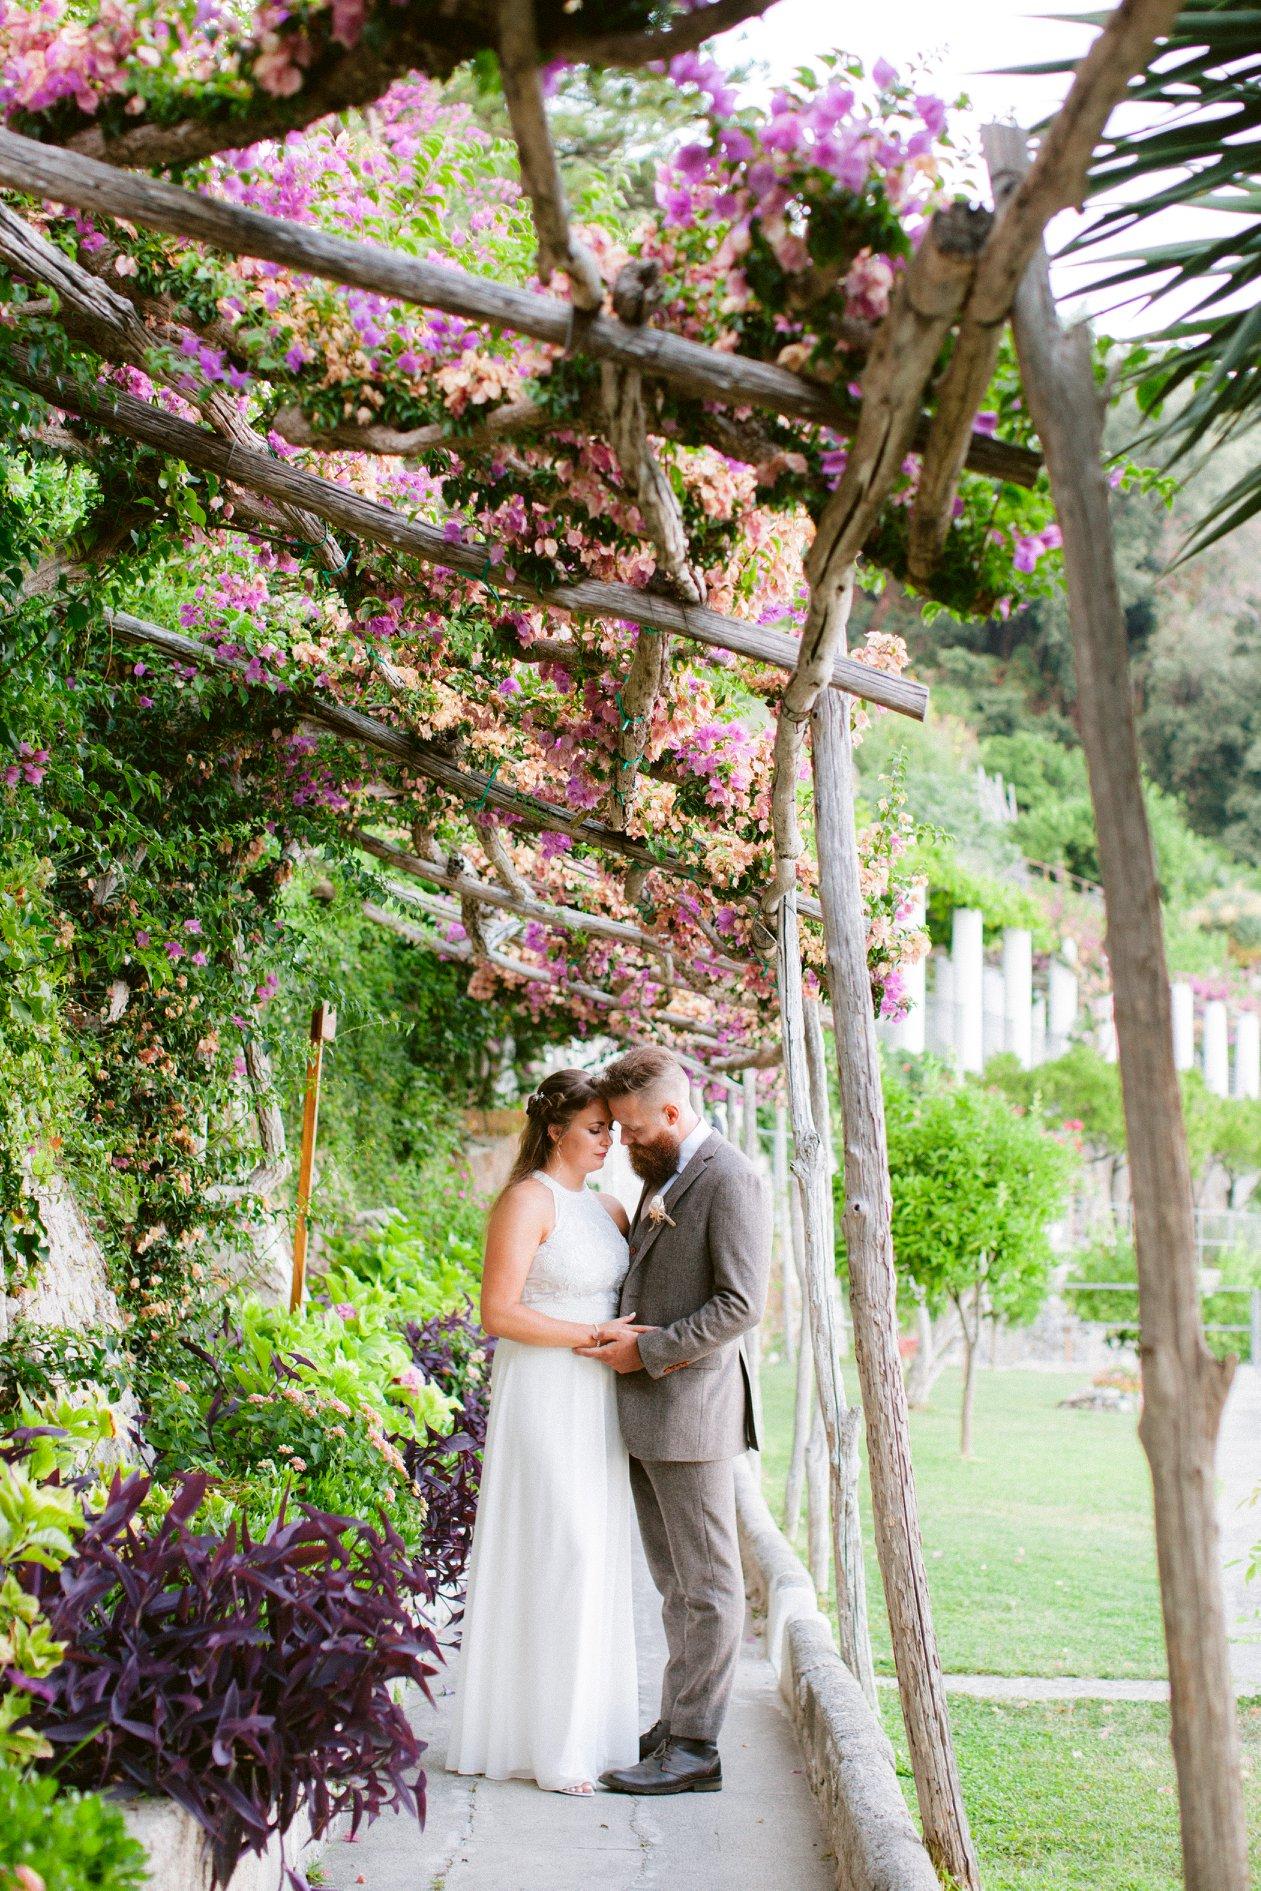 Elain and Declan Wedding in Amalfi (23)